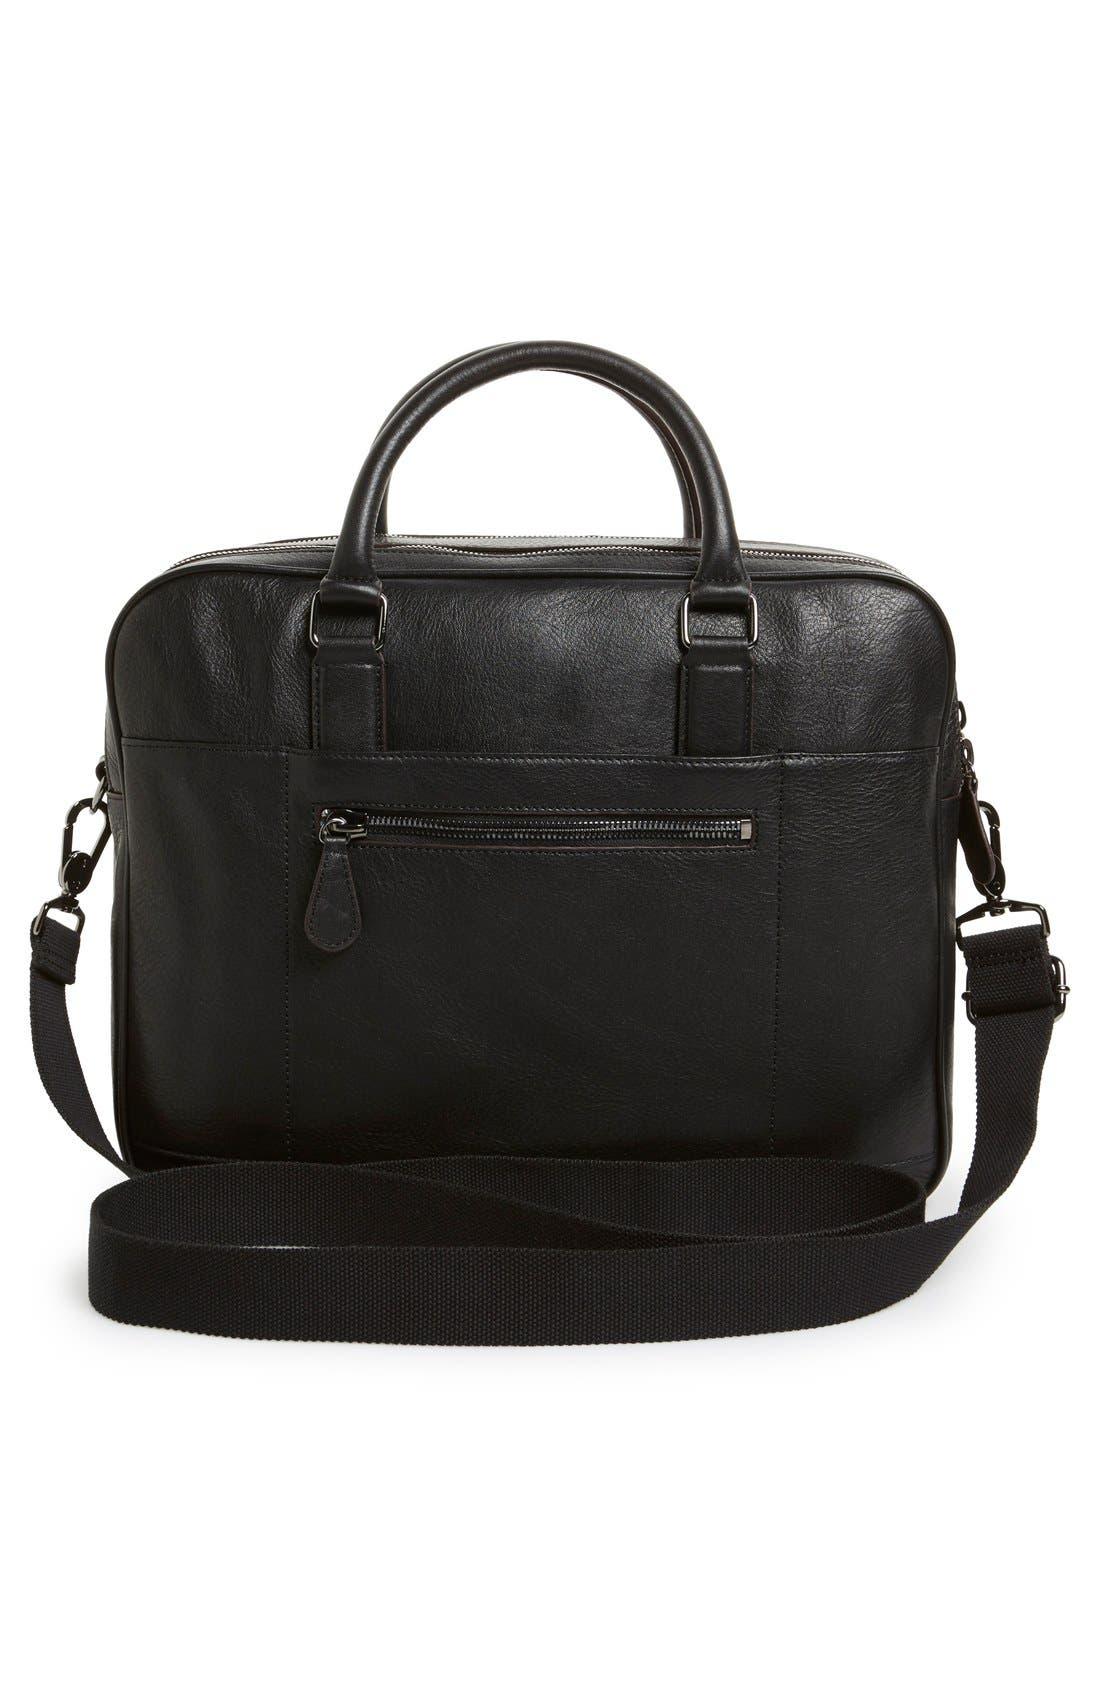 'Ragna' Leather Bowler Bag,                             Alternate thumbnail 3, color,                             001